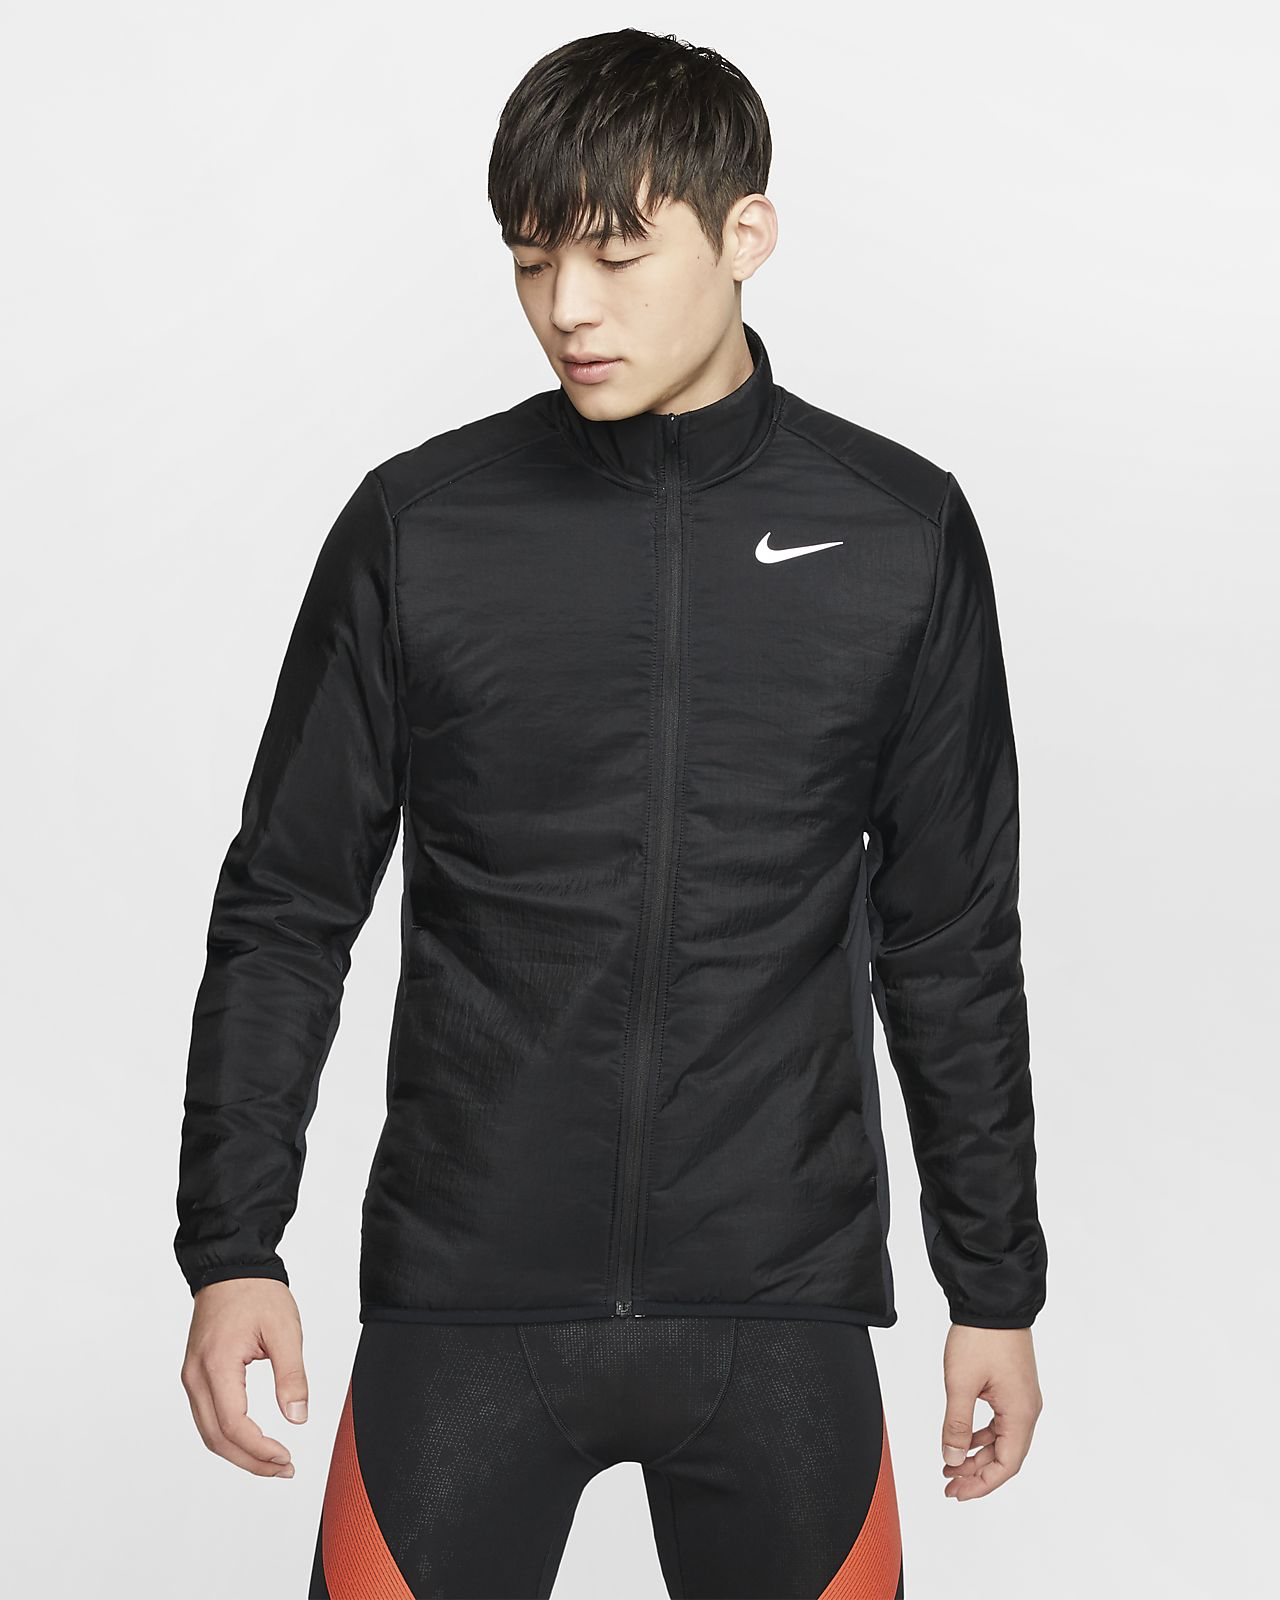 Nike AeroLayer løpejakke til herre